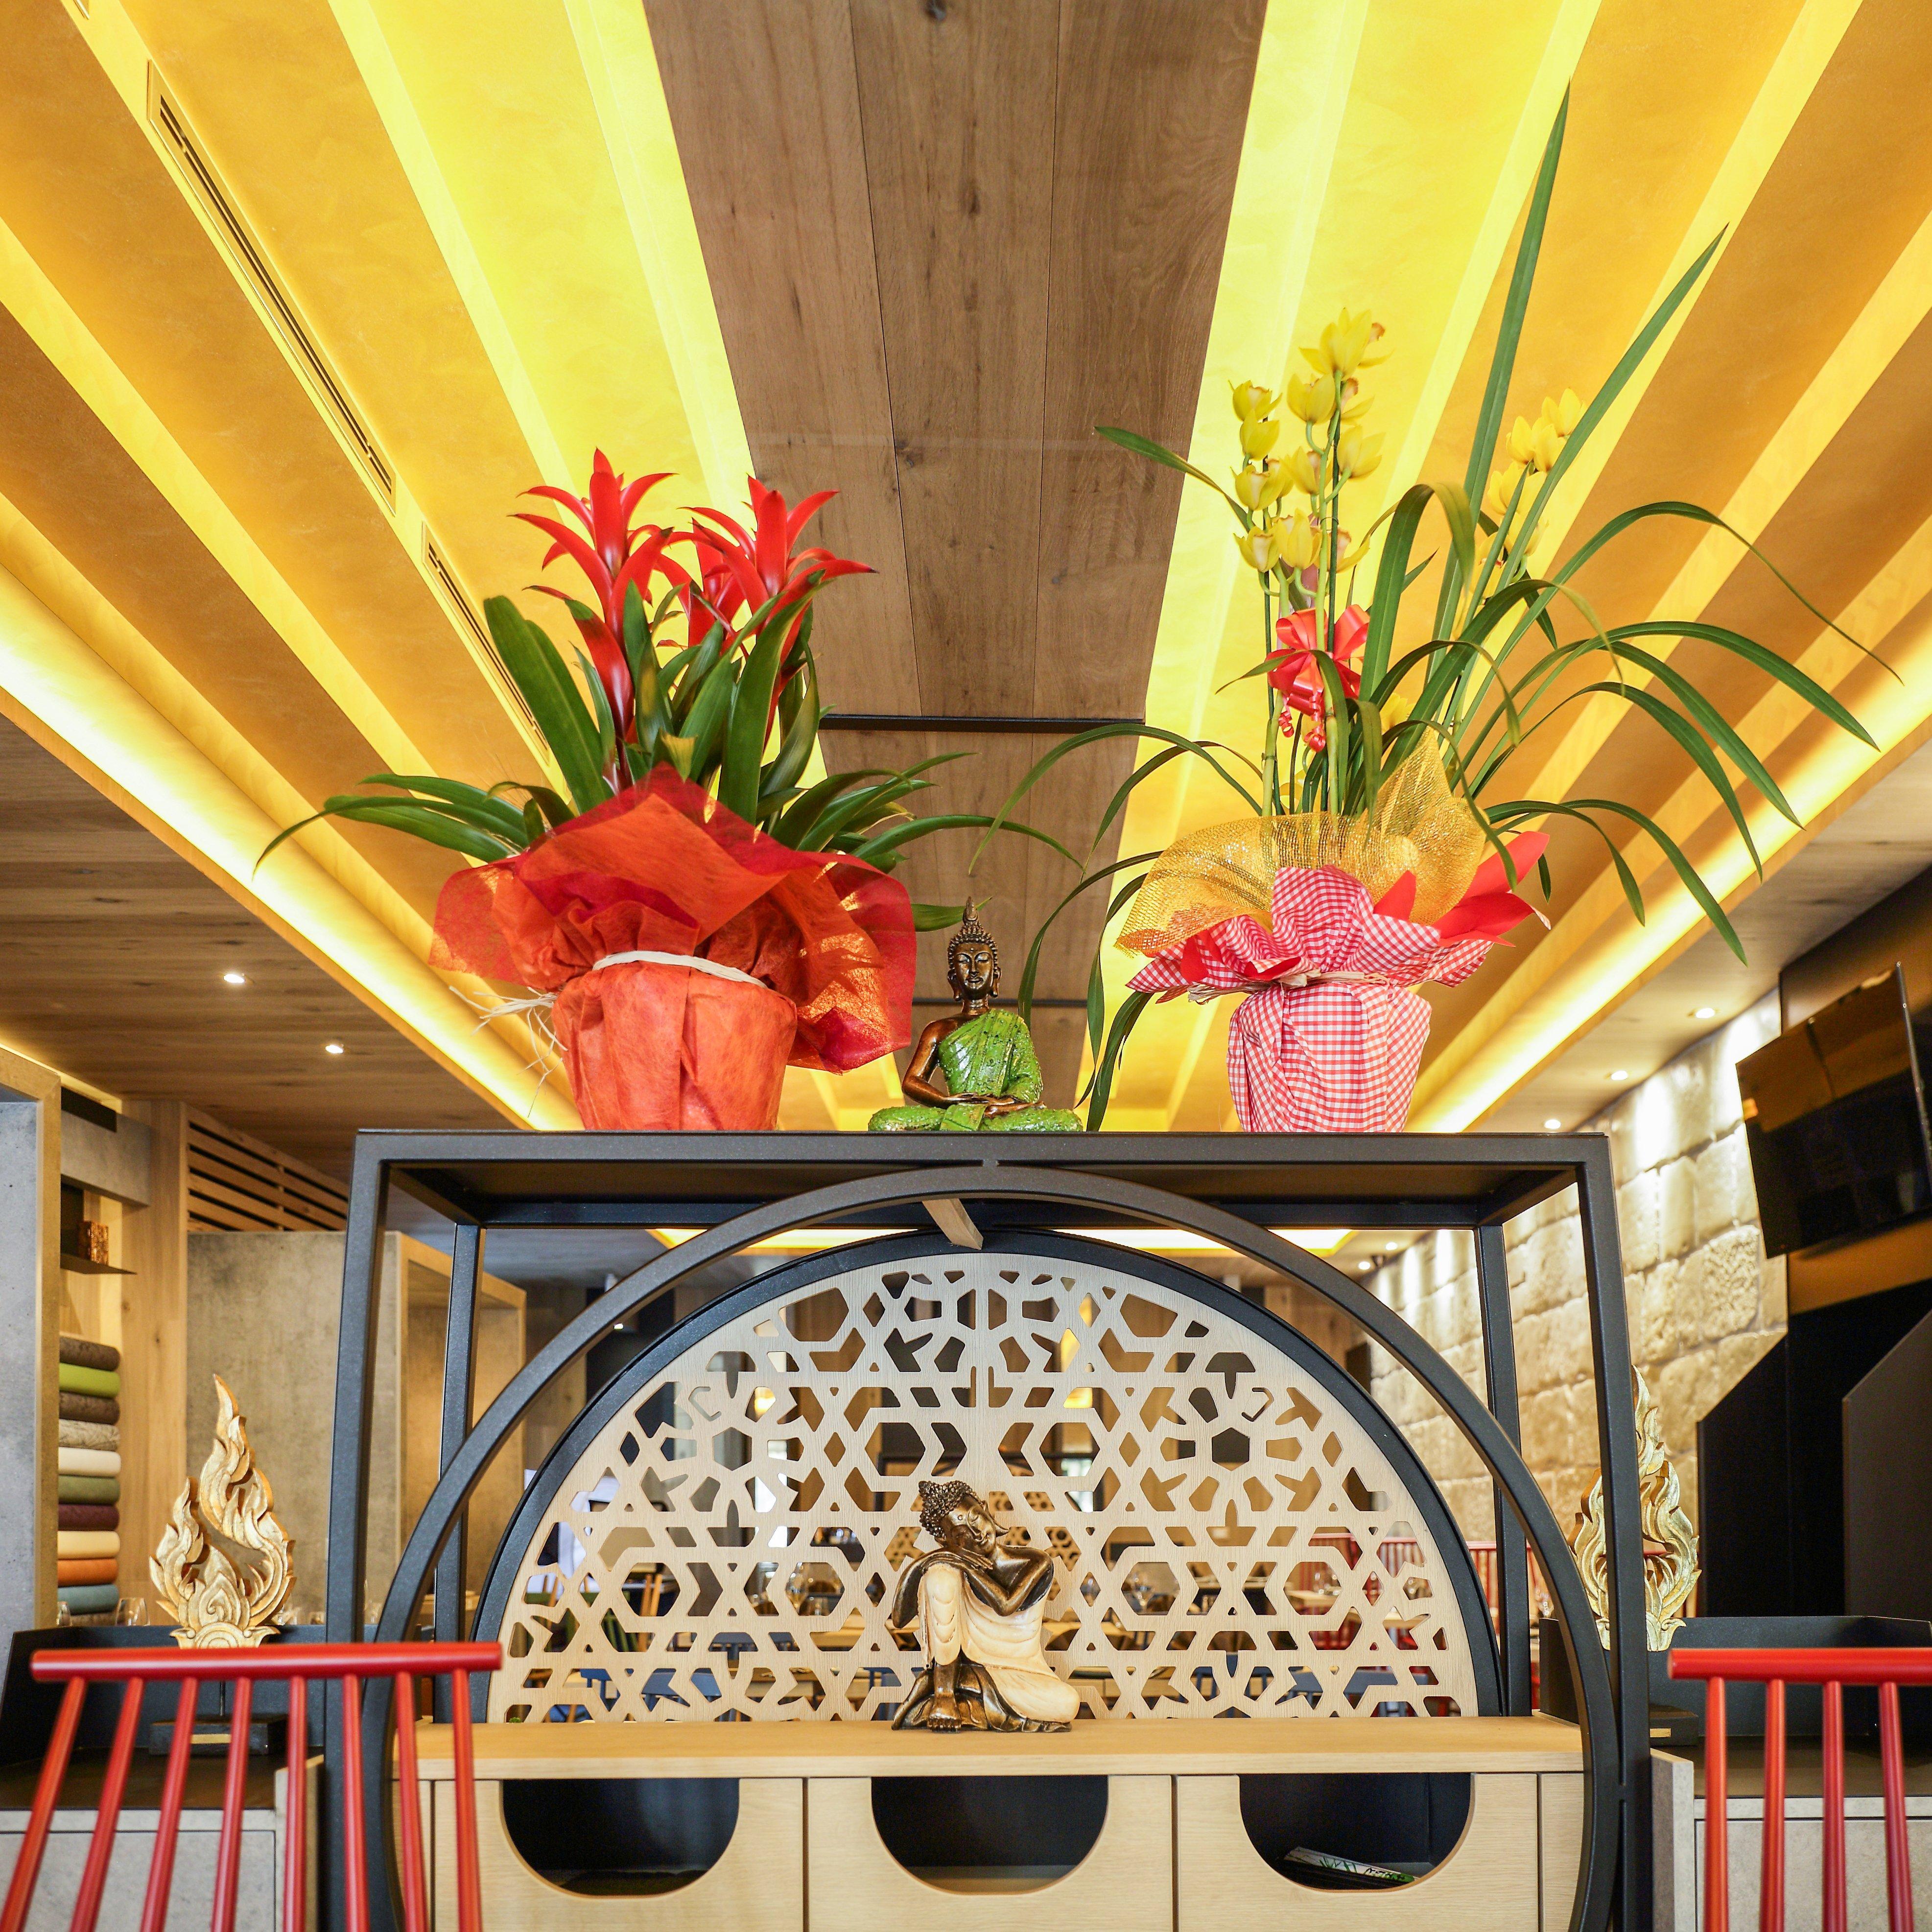 vasi con fiori nel locale